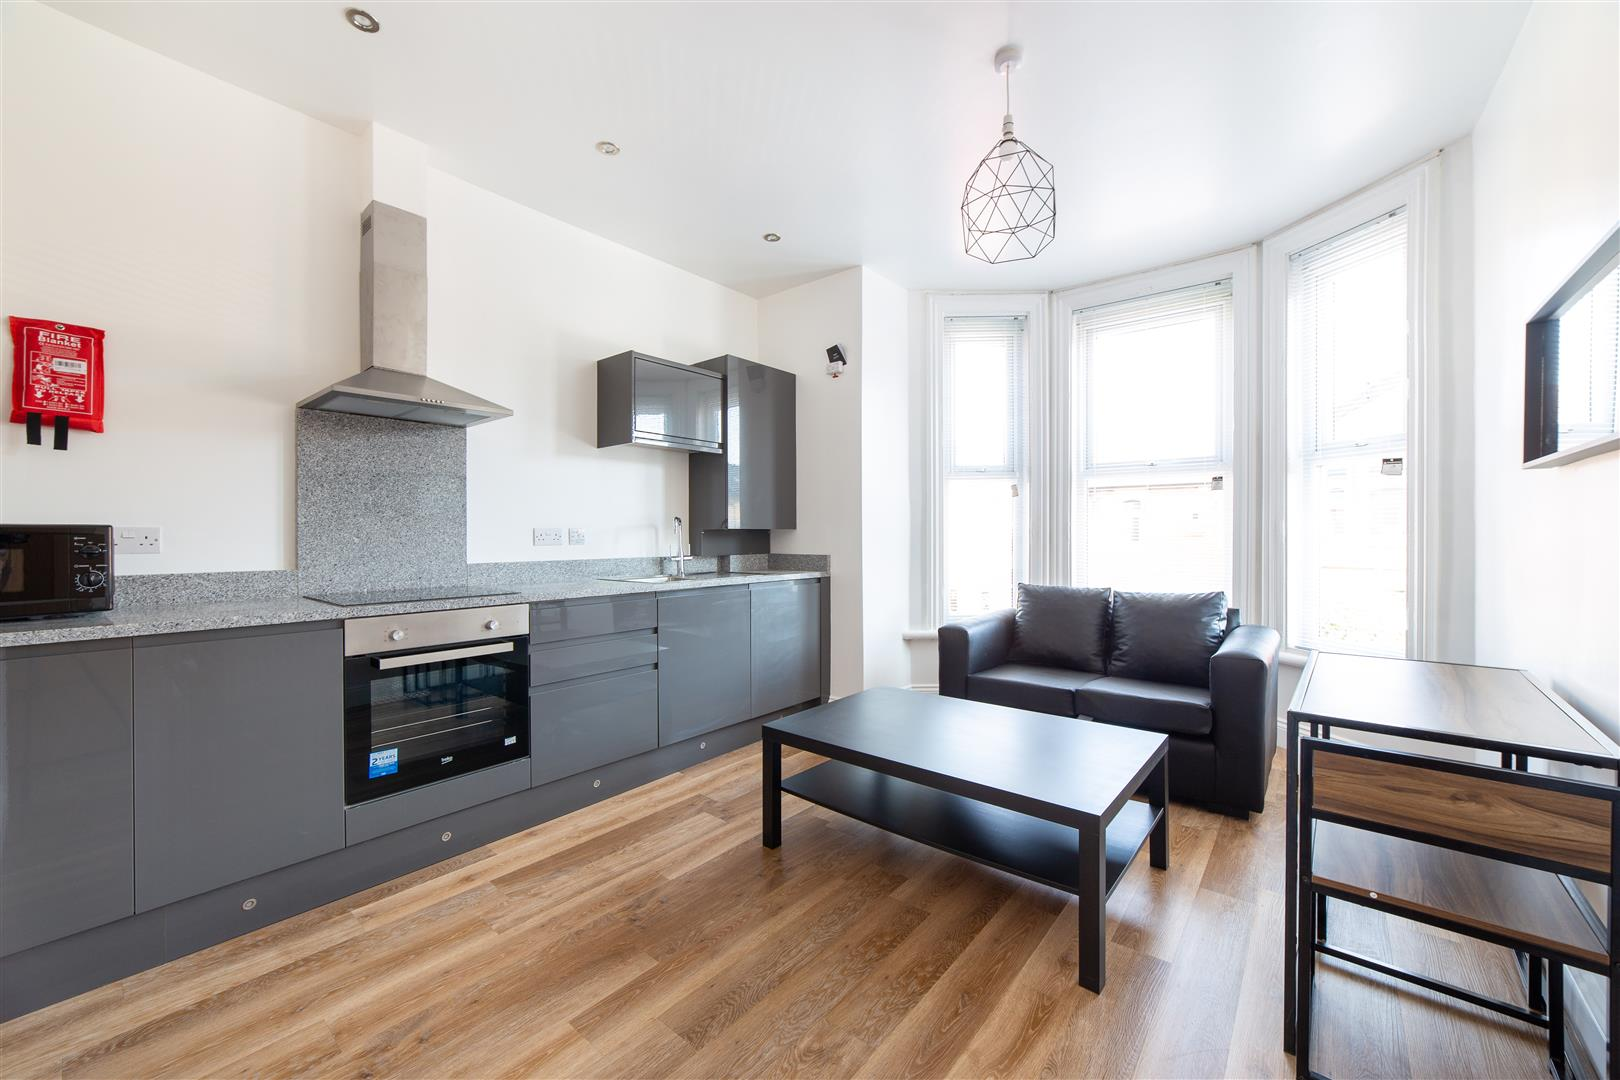 2 bed apartment to rent in Newcastle Upon Tyne, NE2 2PR, NE2